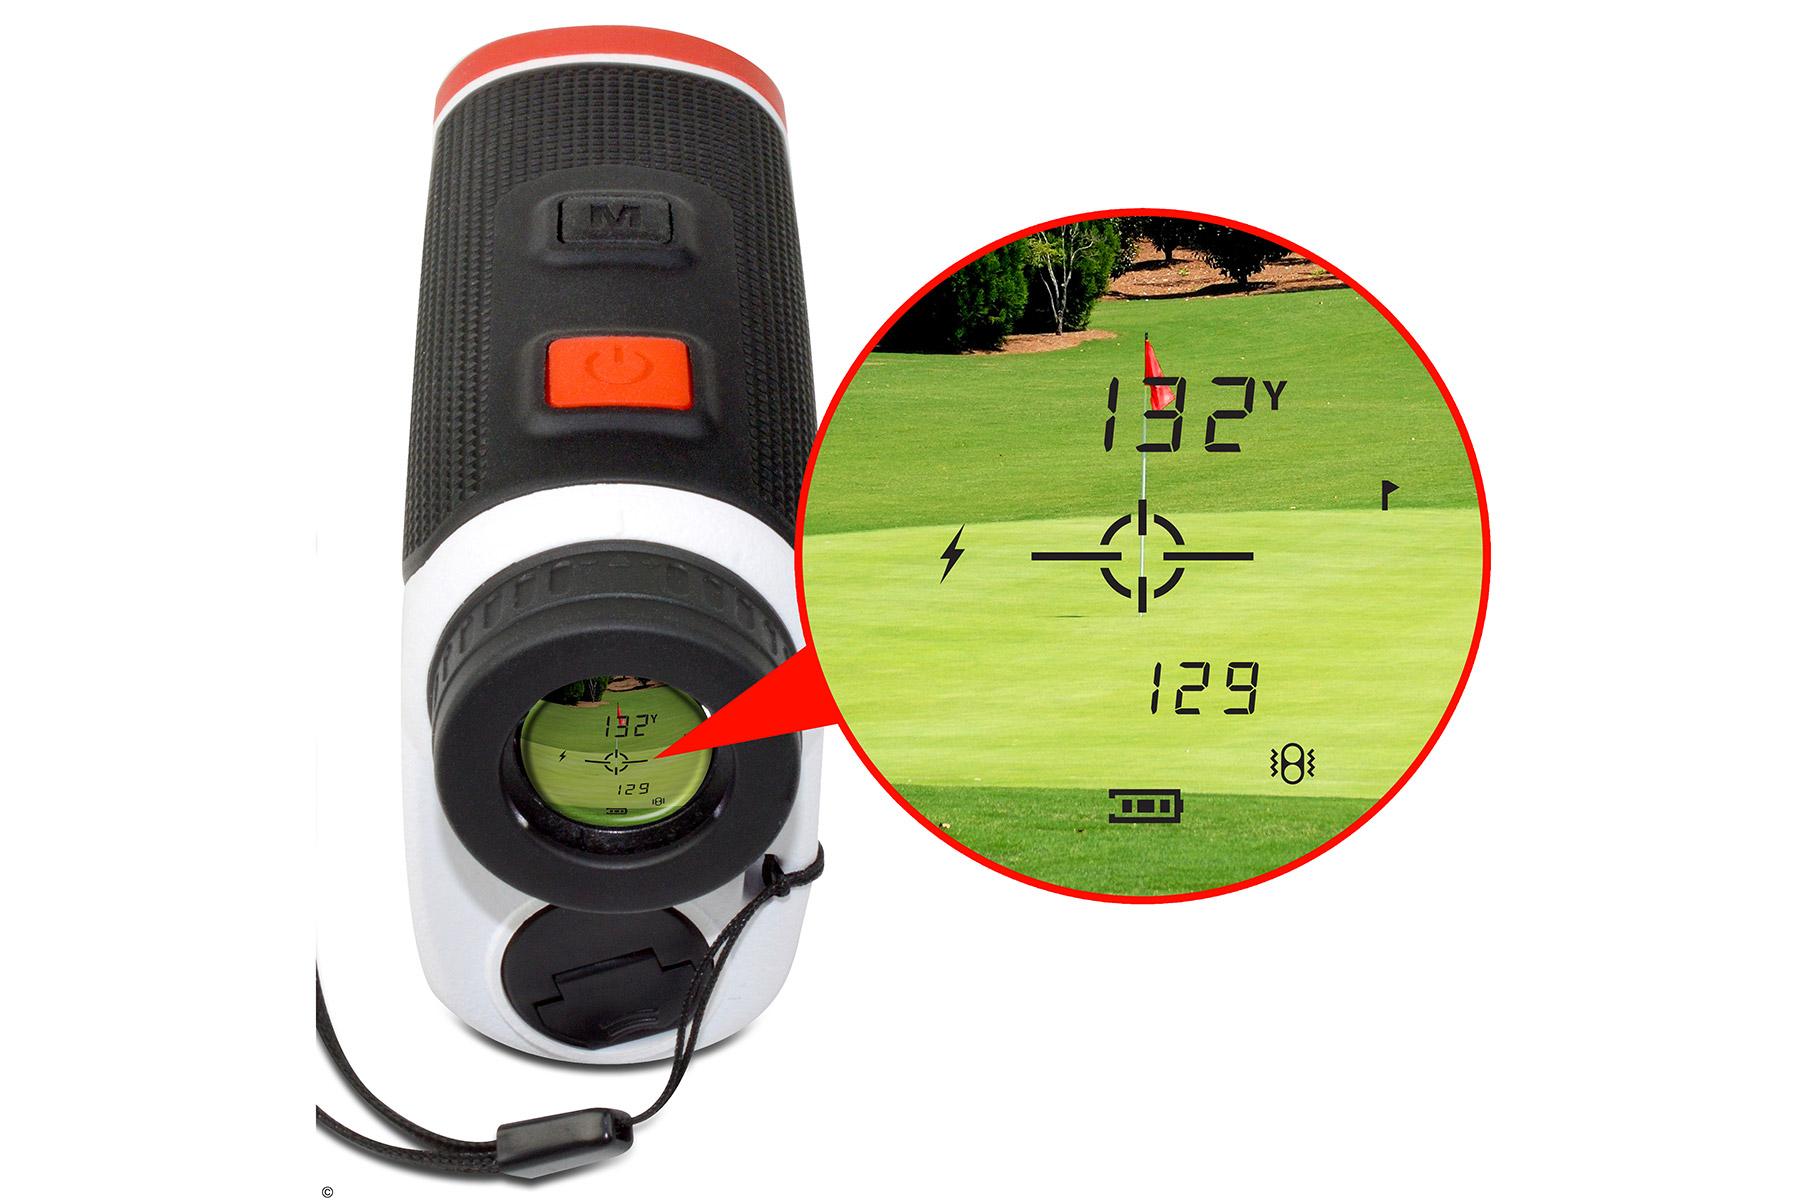 Easygreen 1300 Laser Rangefinder Online Golf